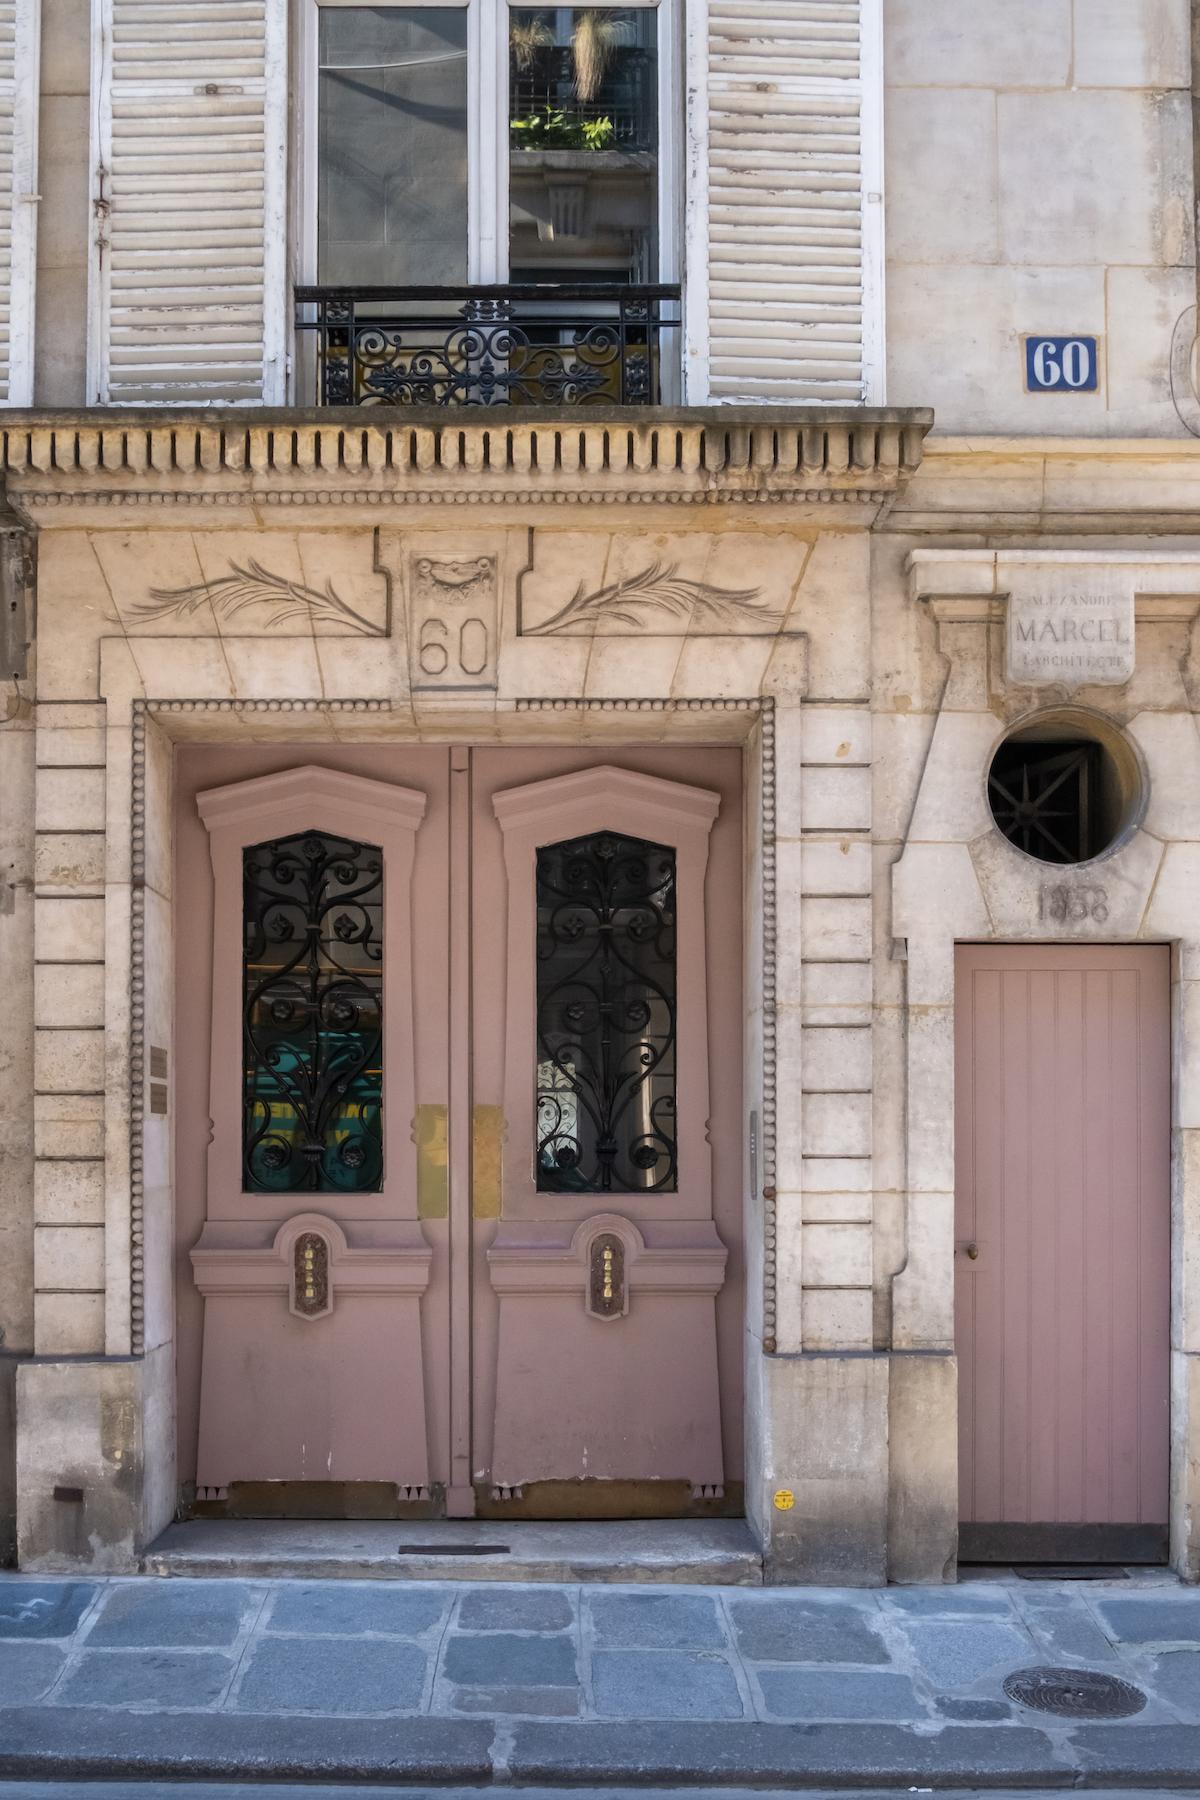 learning french in paris lutece langue rue de bellechasse